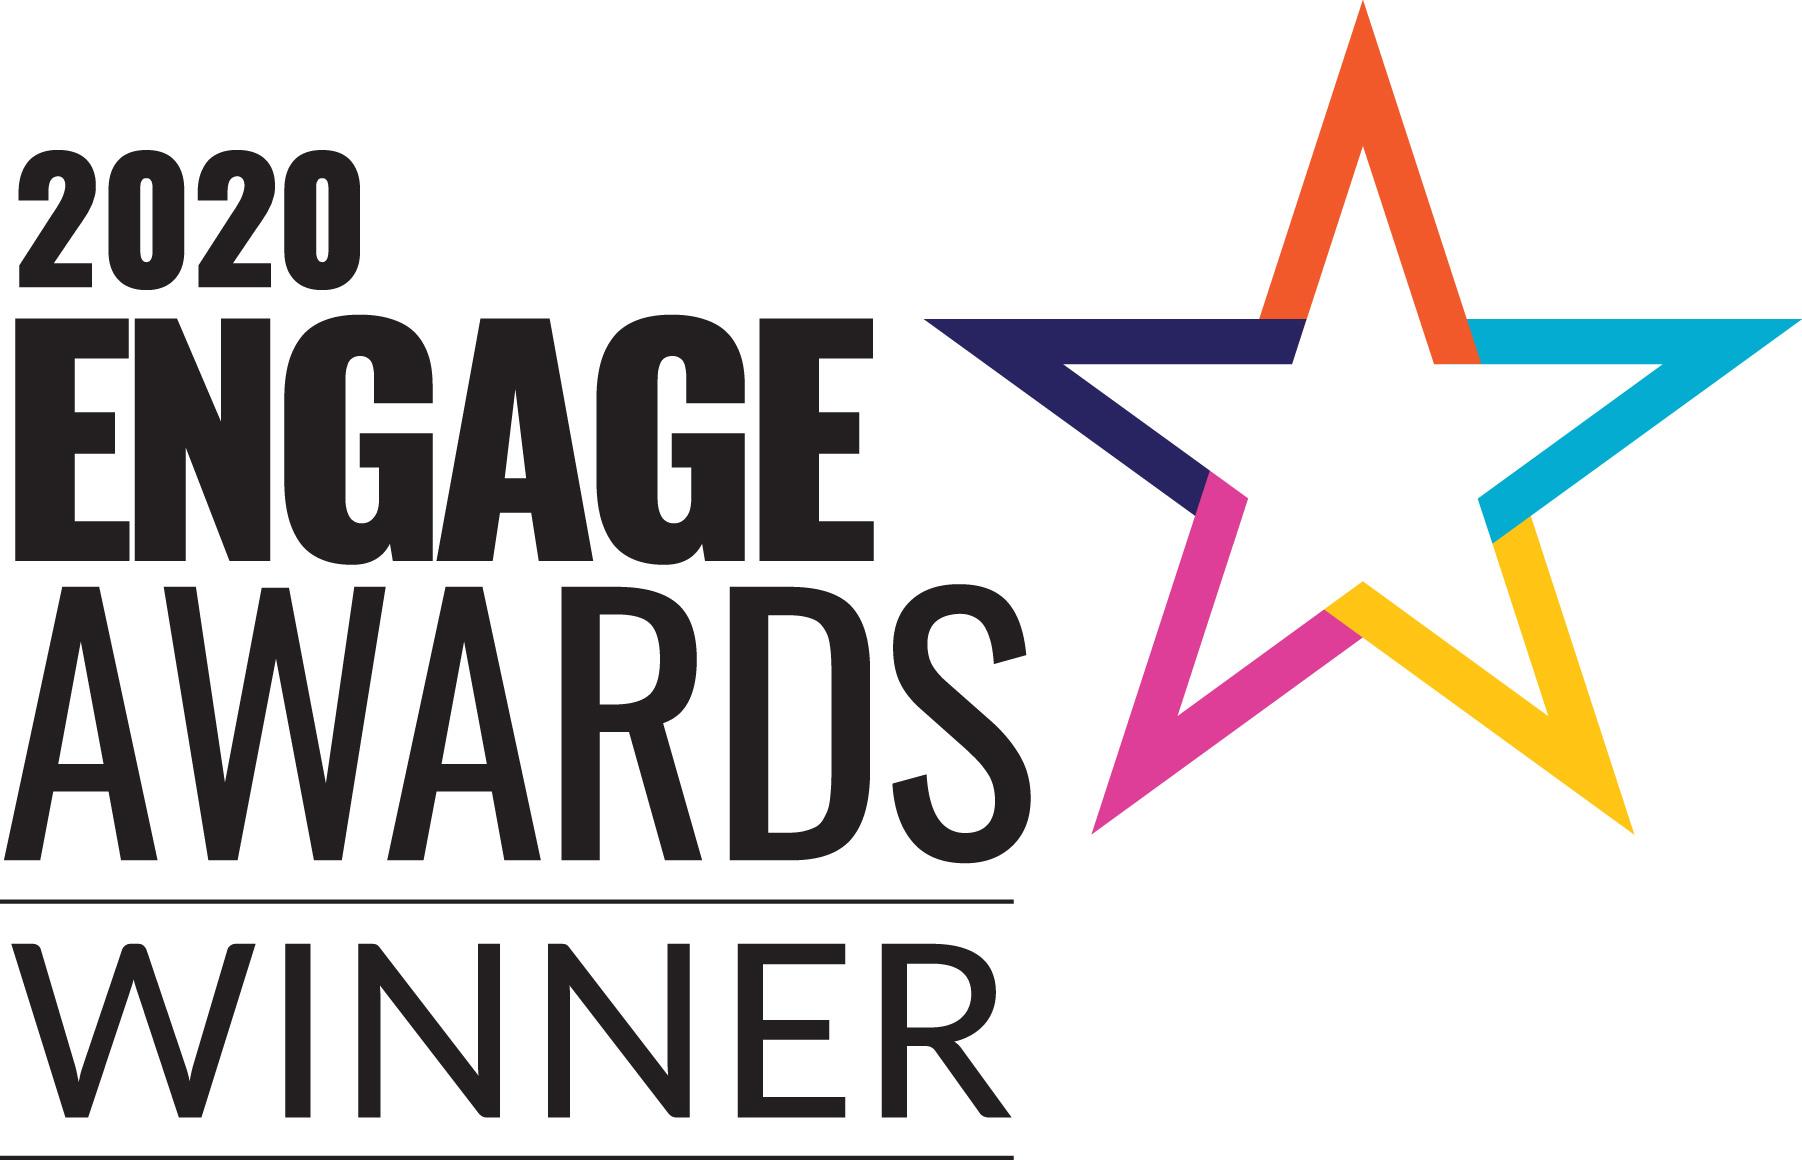 Engage Award Winner 2020